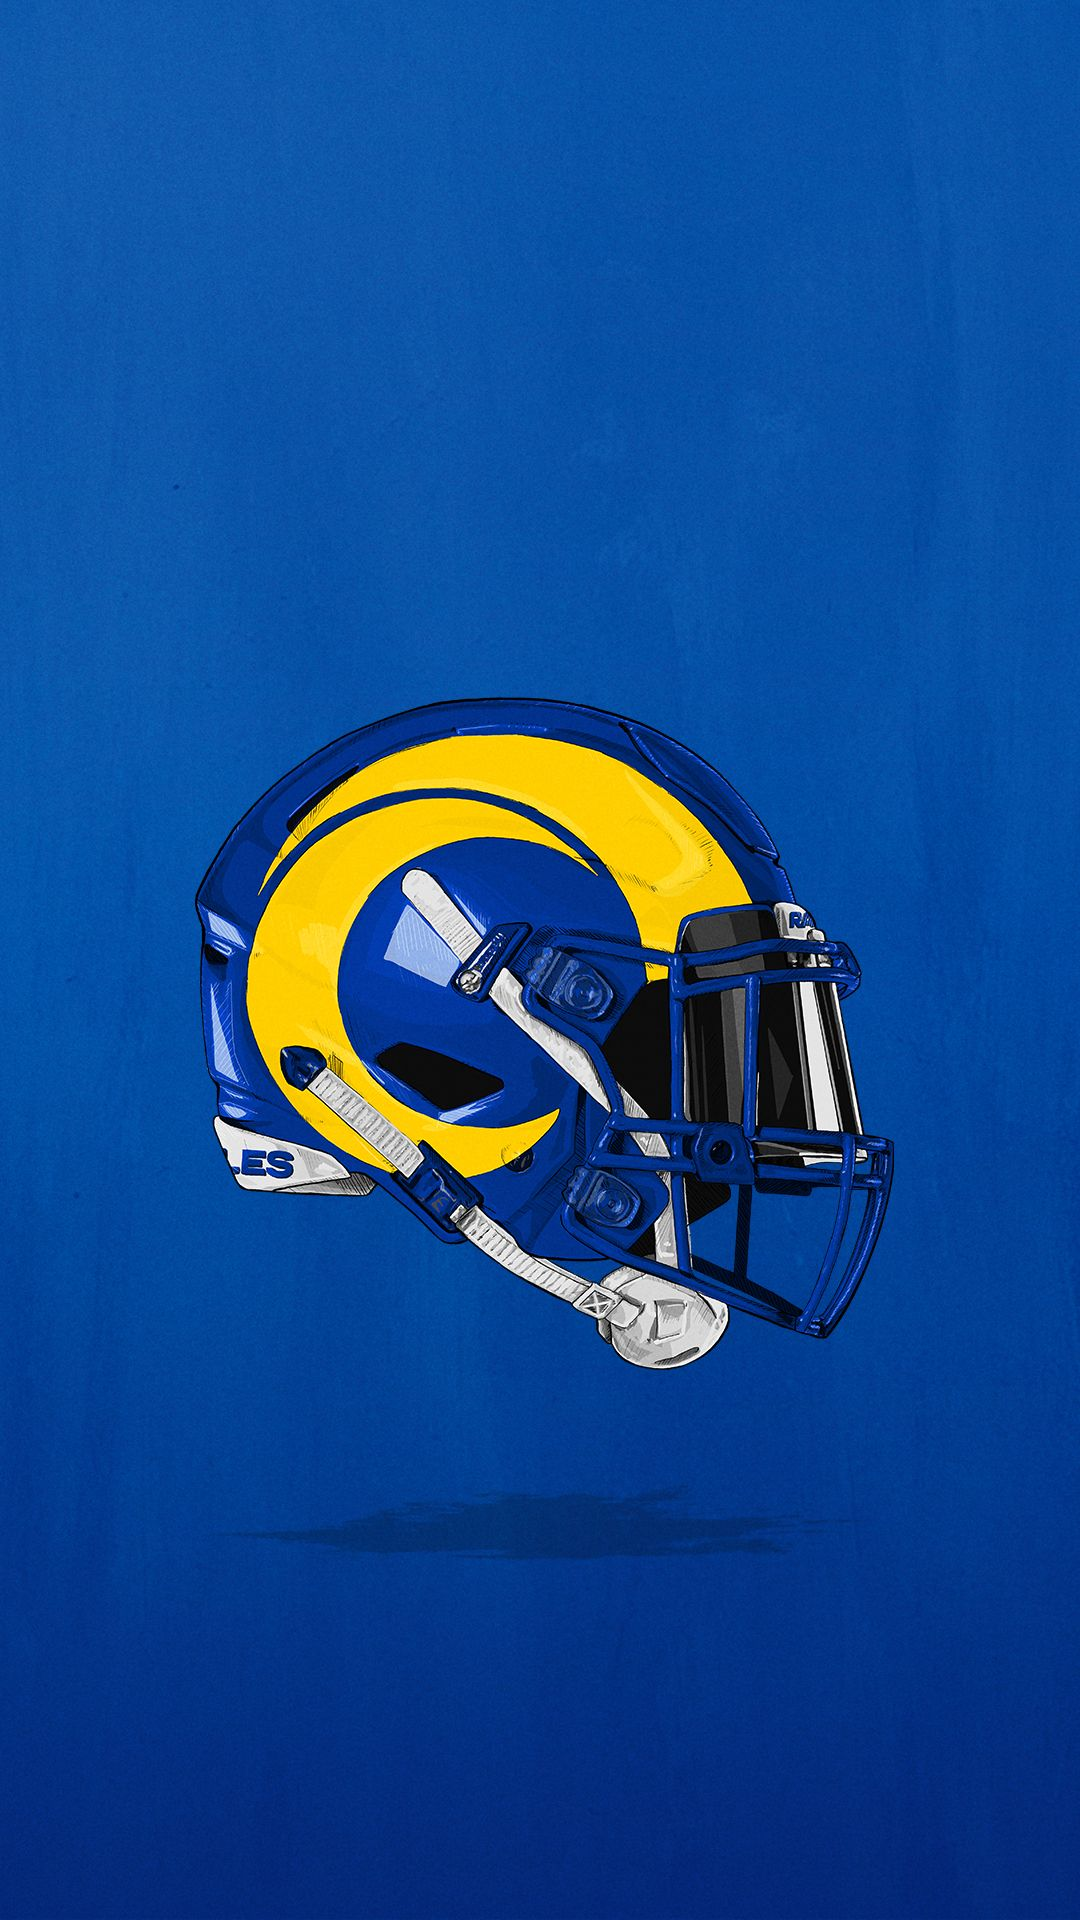 Los Angeles Rams on Twitter Los angeles rams Cool football 1080x1920